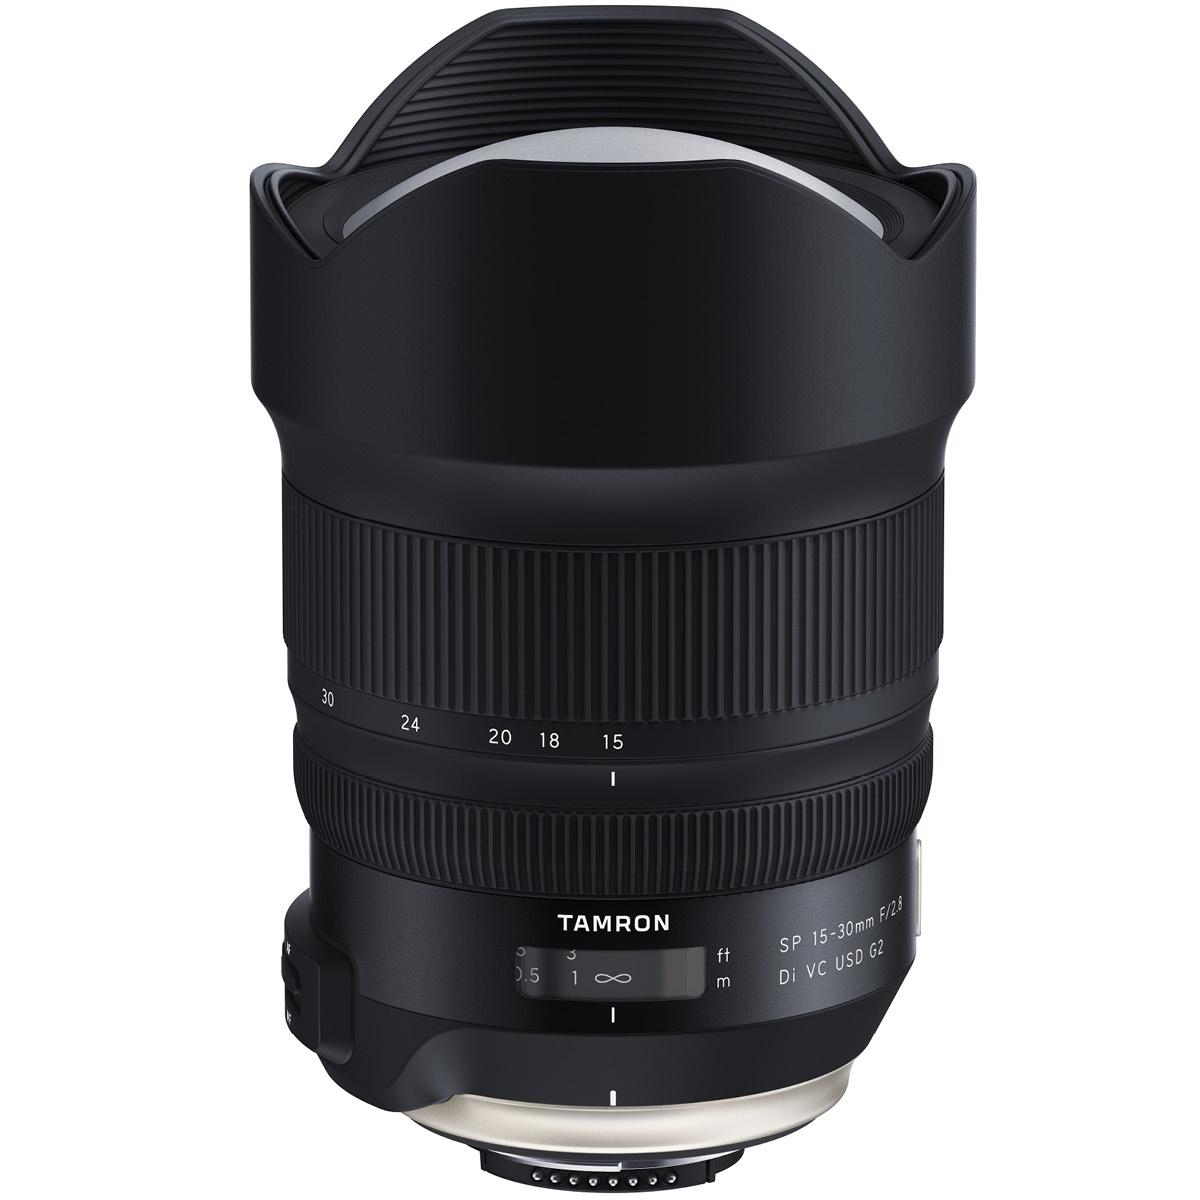 Tamron 15-30 mm 1:2,8 VC DI USD G2 FX